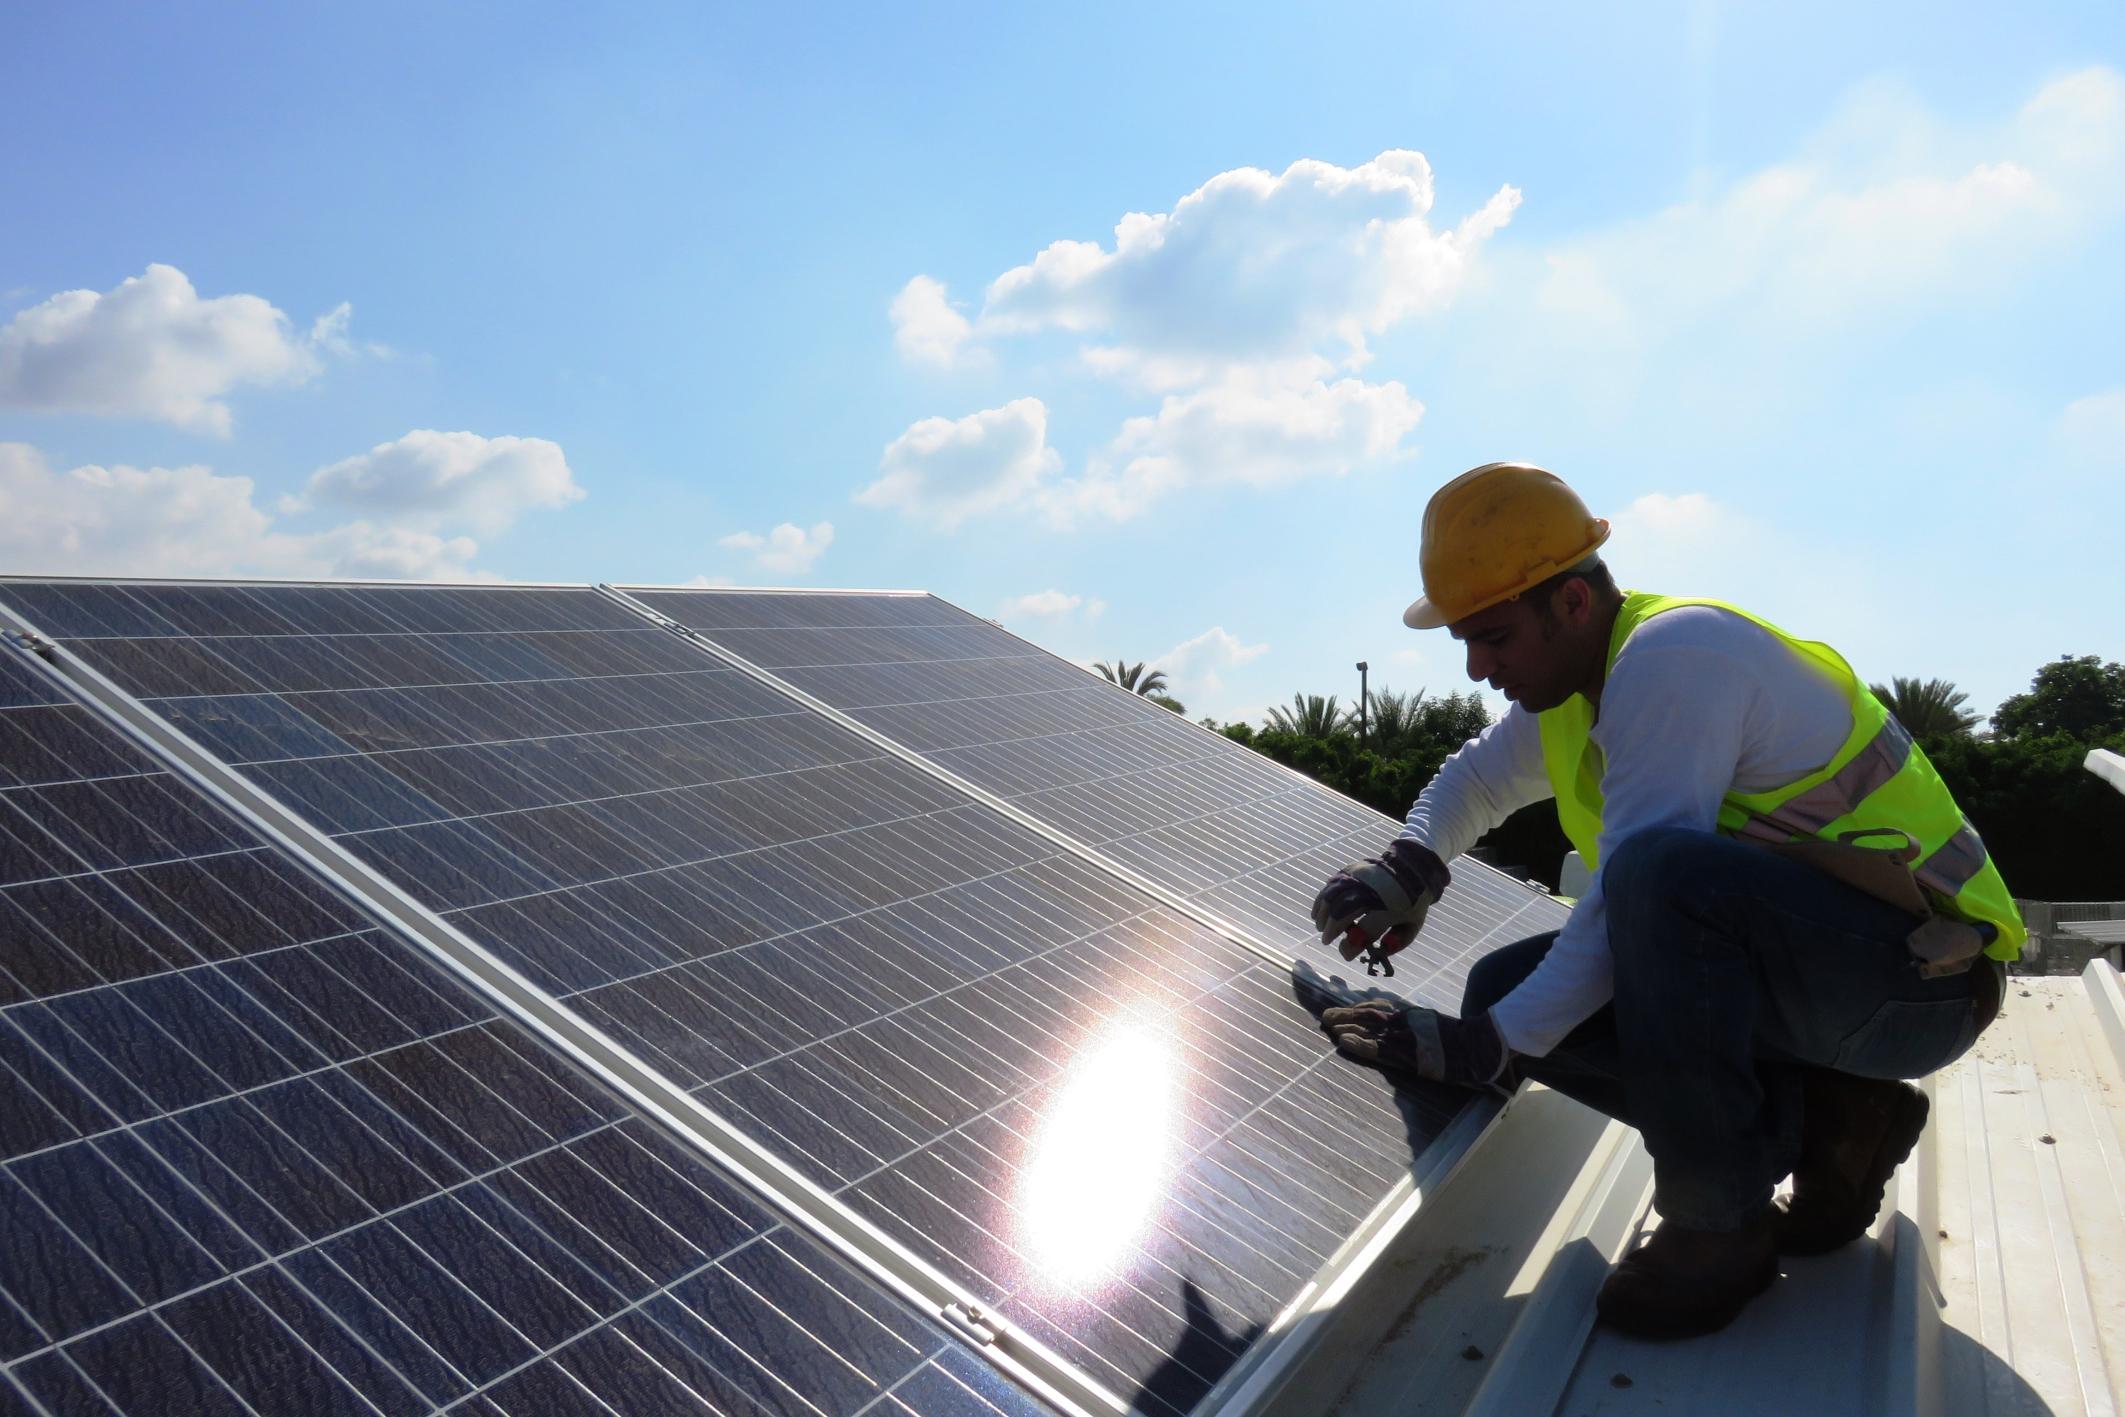 Construction worker installing rooftop solar panels